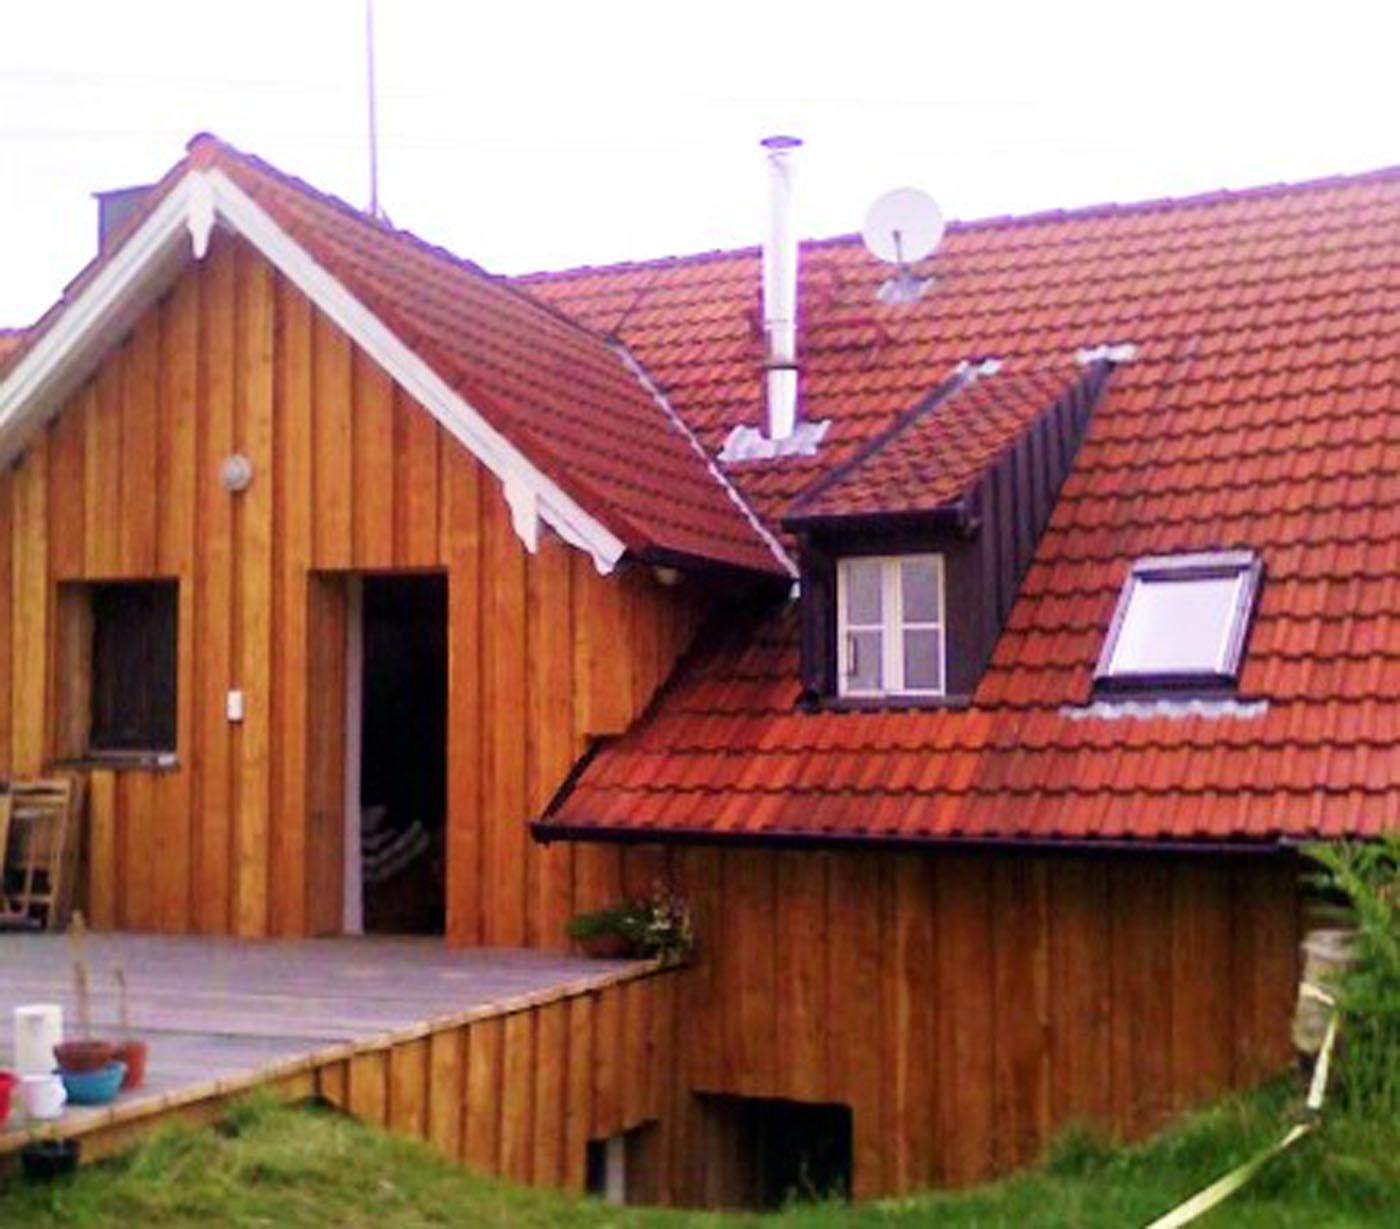 Holzfassaden und Wärmedämmung